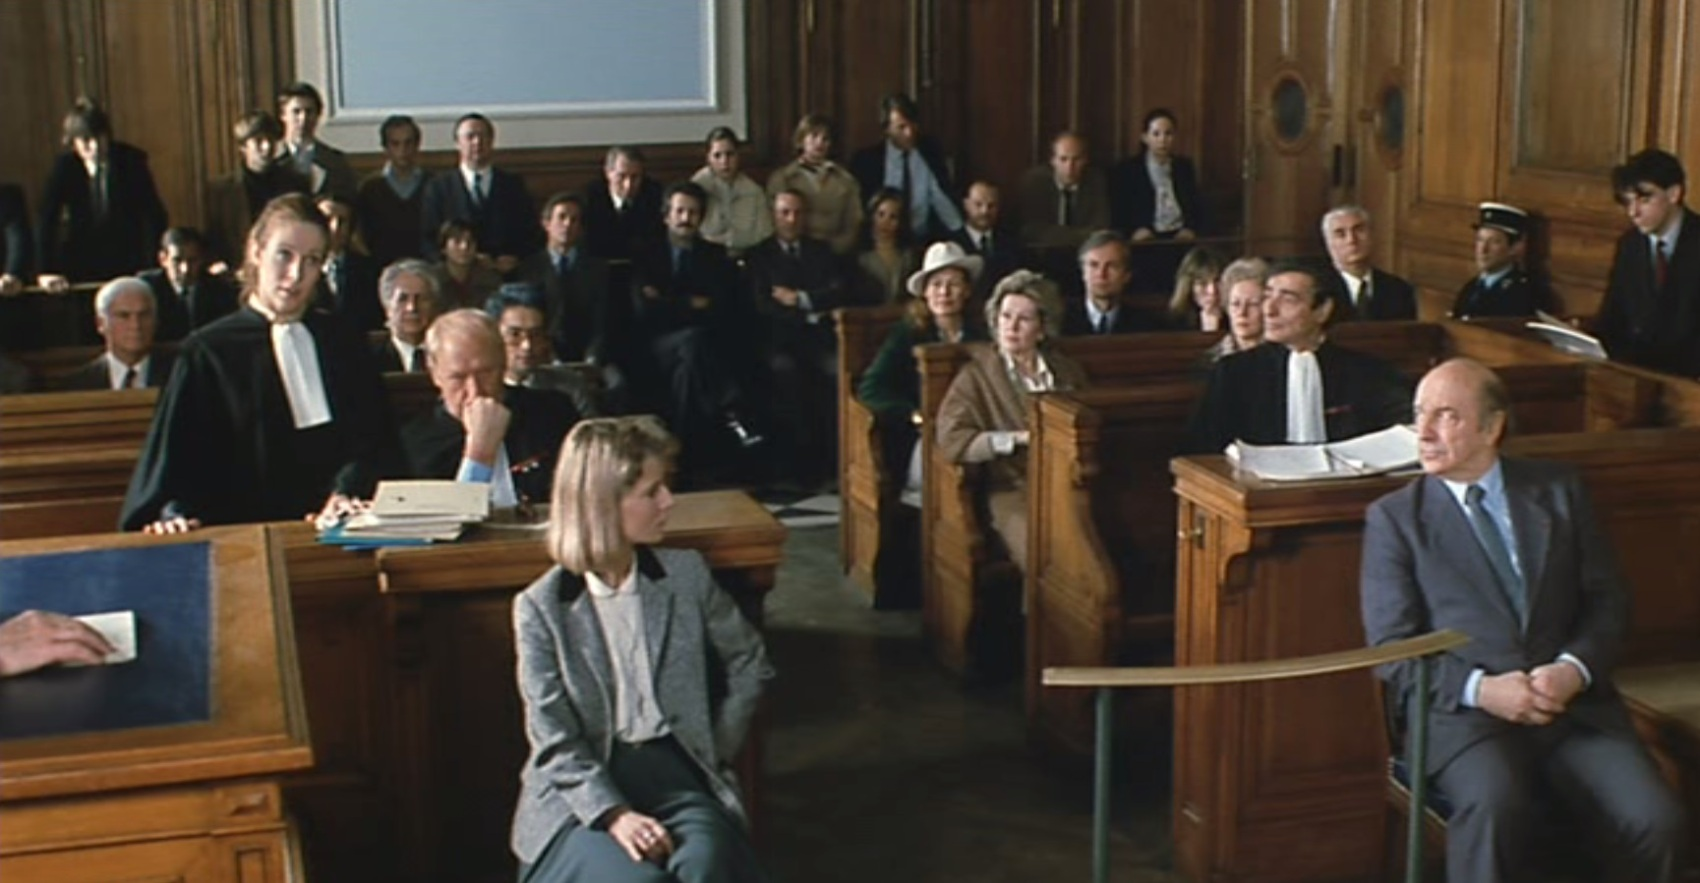 Honneur d'un capitaine, film de Pierre Schoendoerffer, Claude Jade, Charles Denner, Nicole Garcia